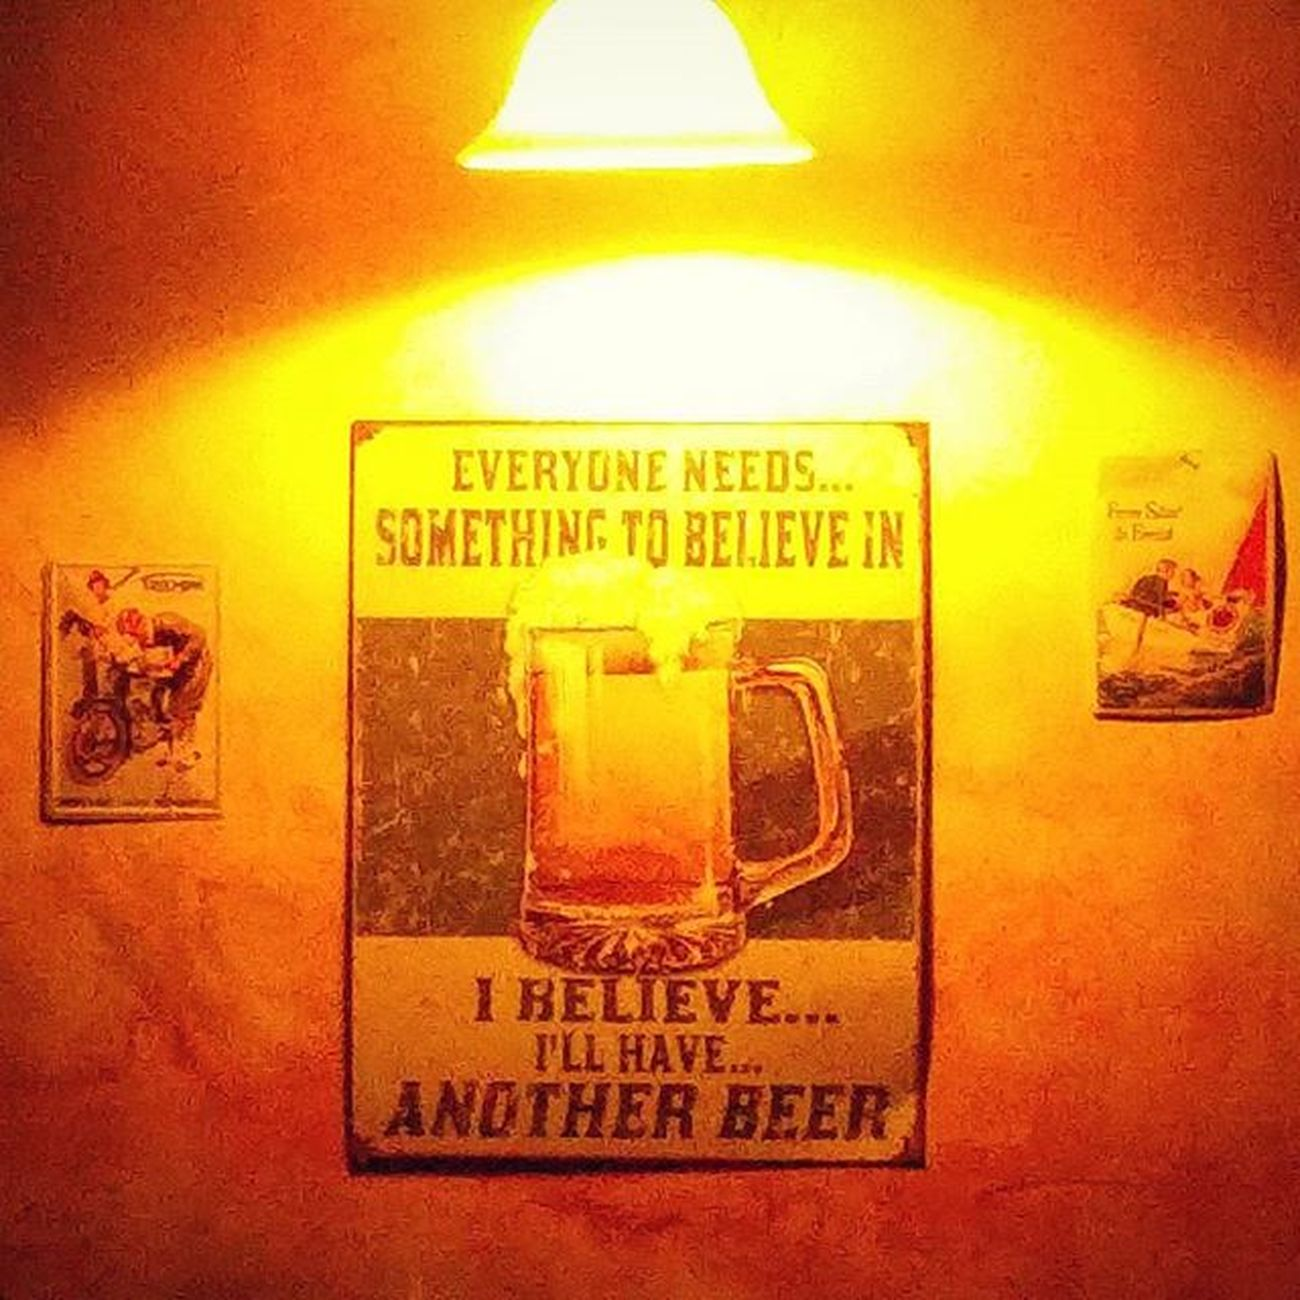 I believe I'll have another beer! Beer Onemore Lastone Delicious Indie IndieMusic Happy Iwantmore Instaphoto Instadrunk Instaalchoholic Instaalchohol Fucky 'all